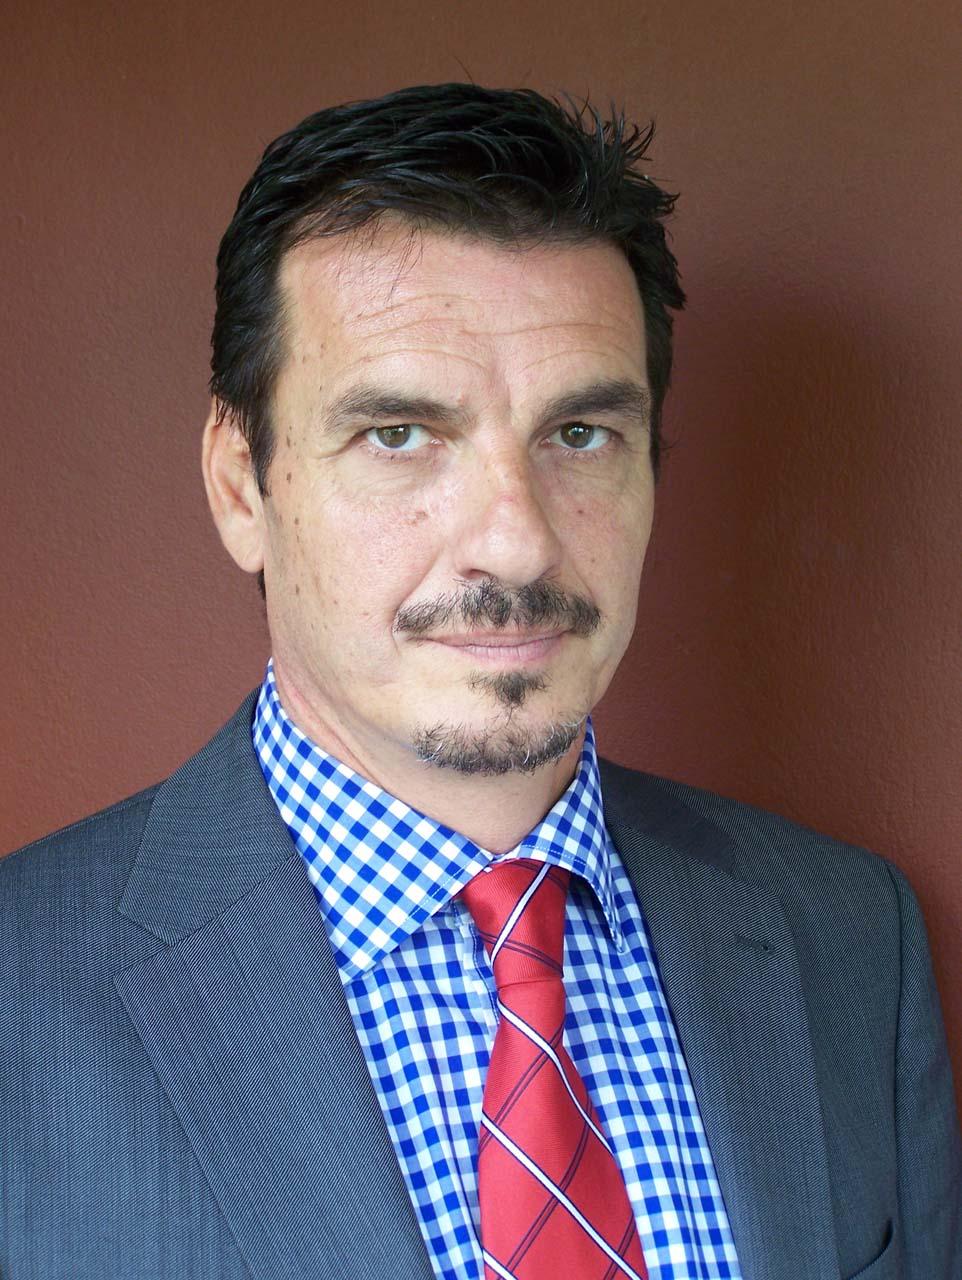 Giorgos Voulgaris